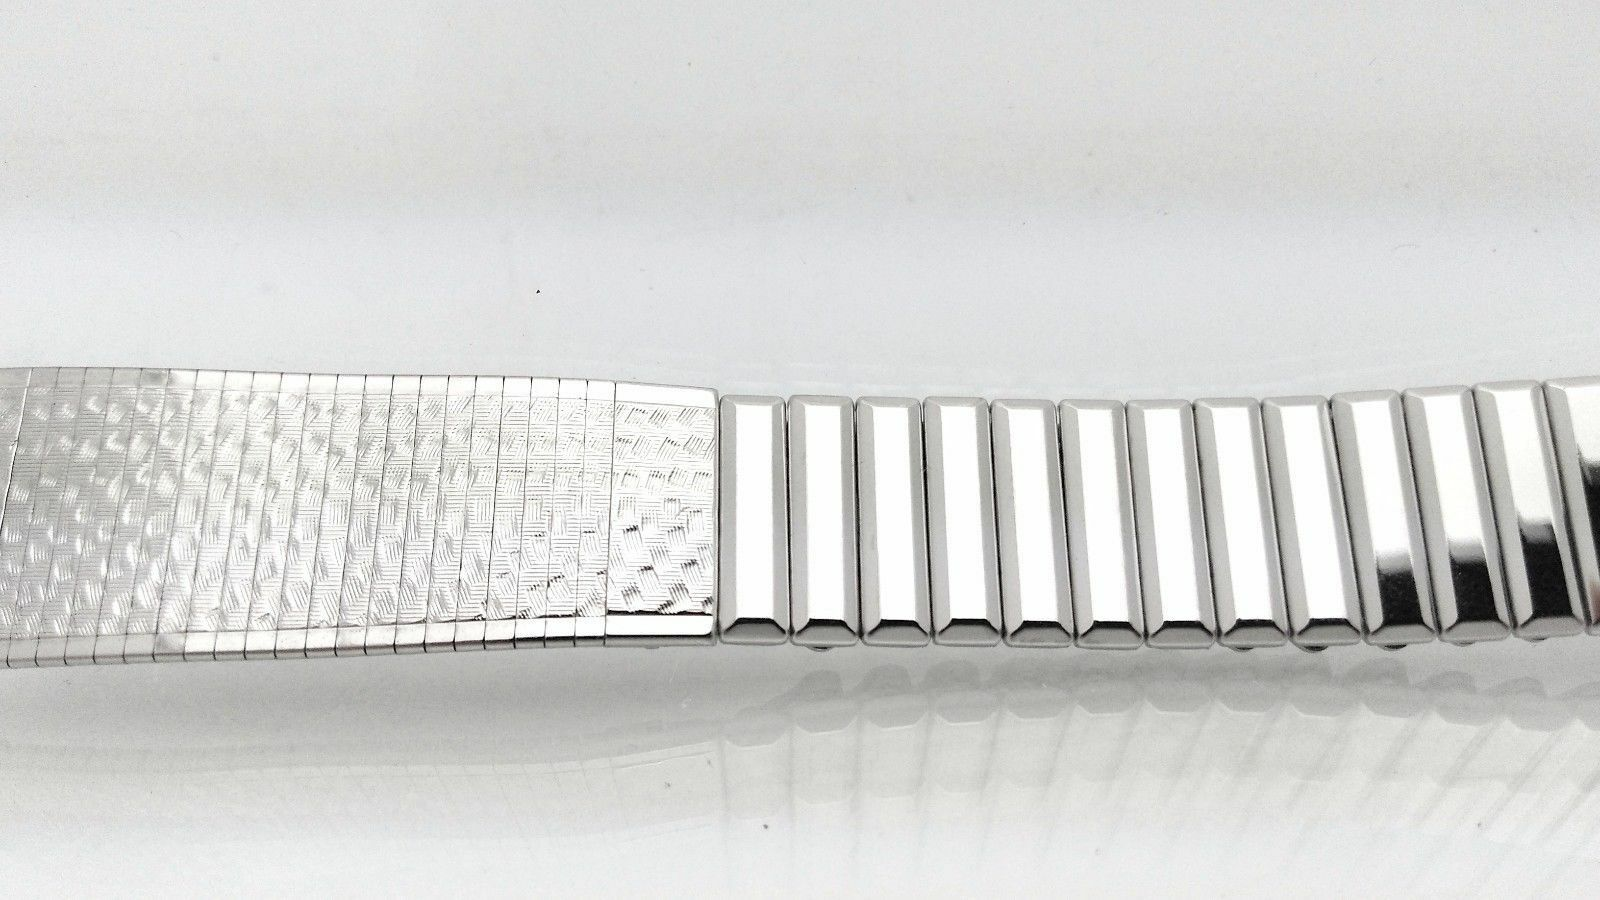 Vintage-60s-Mens-Stainless-Kreisler-18mm-NOS-Scissor-Expansion-Watch-Band-Peen-361935511638-2.jpg